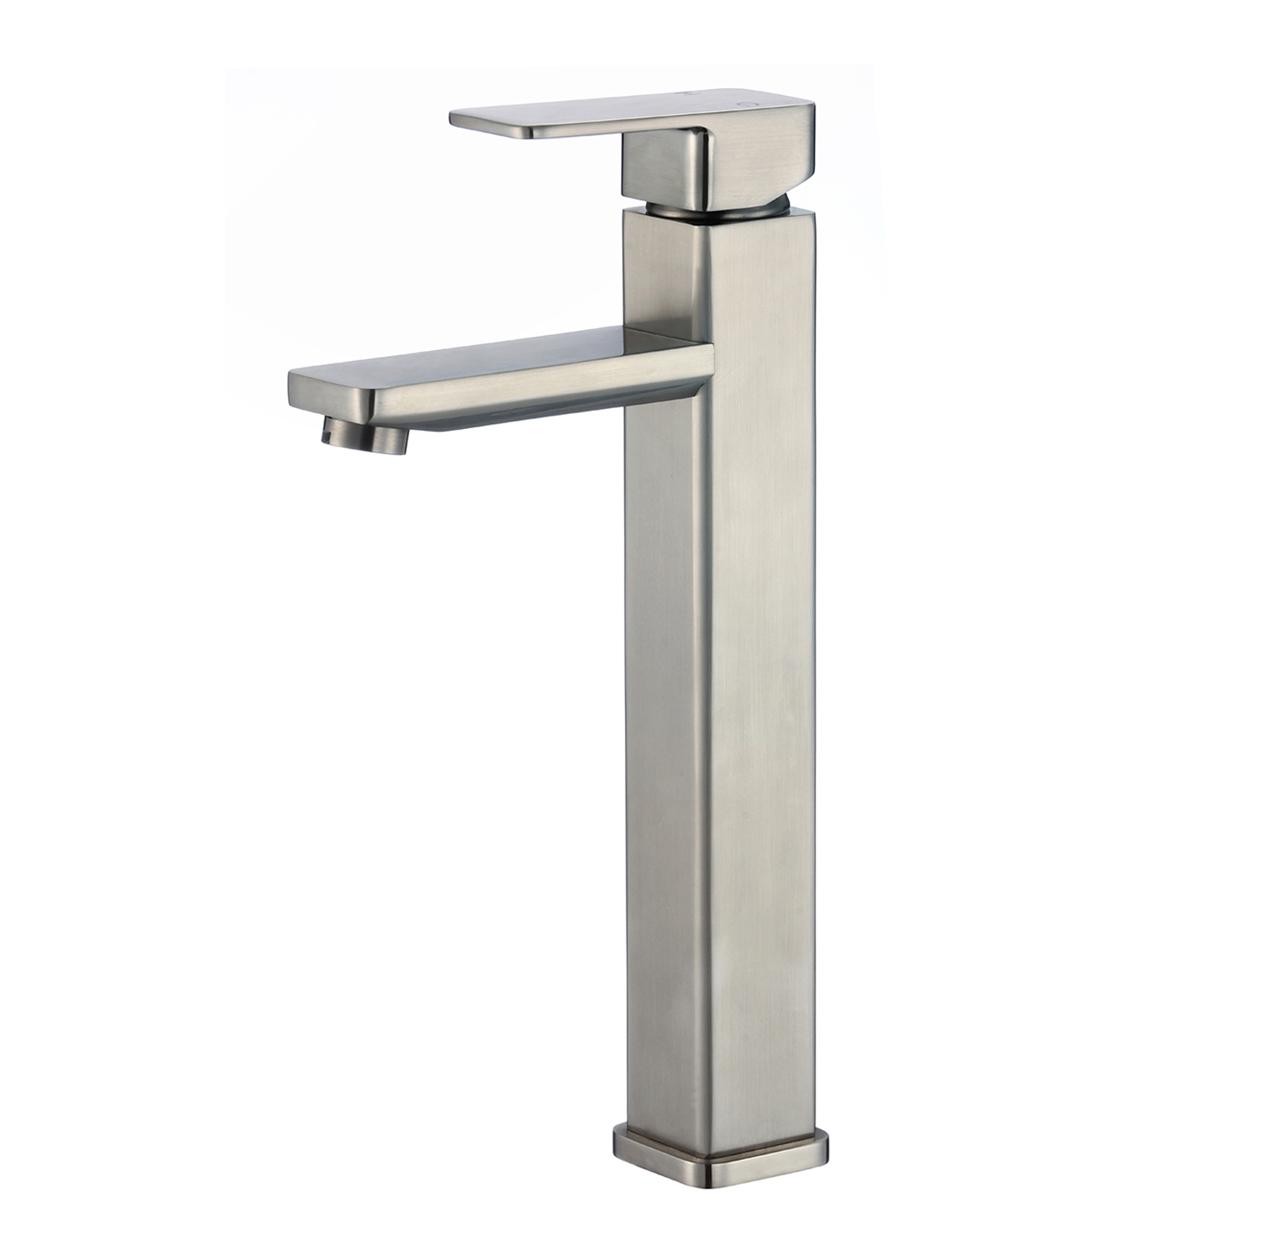 Montreuil Single Handle Deck Mounted Bathroom Sink Faucet